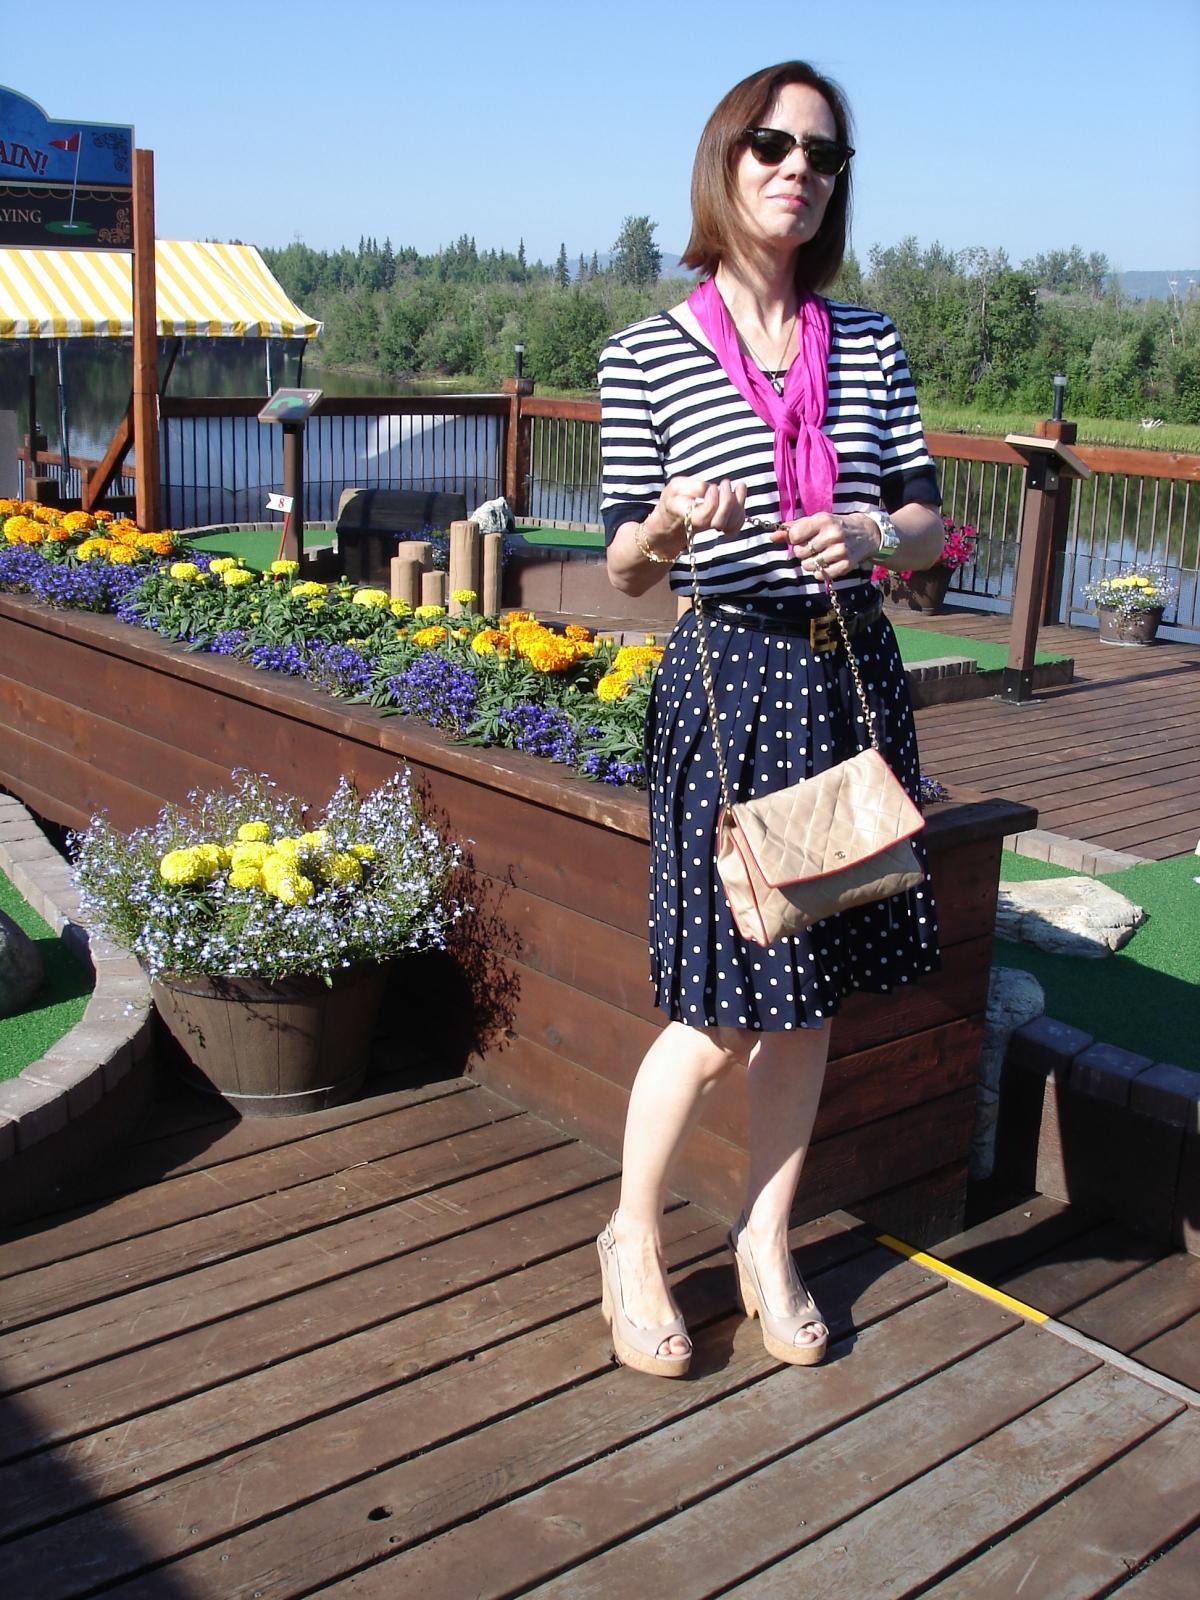 #40 #50 how 2 dress 4 a picnic over 40 | High Latitude Style | http://www.highlatitudestyle.com